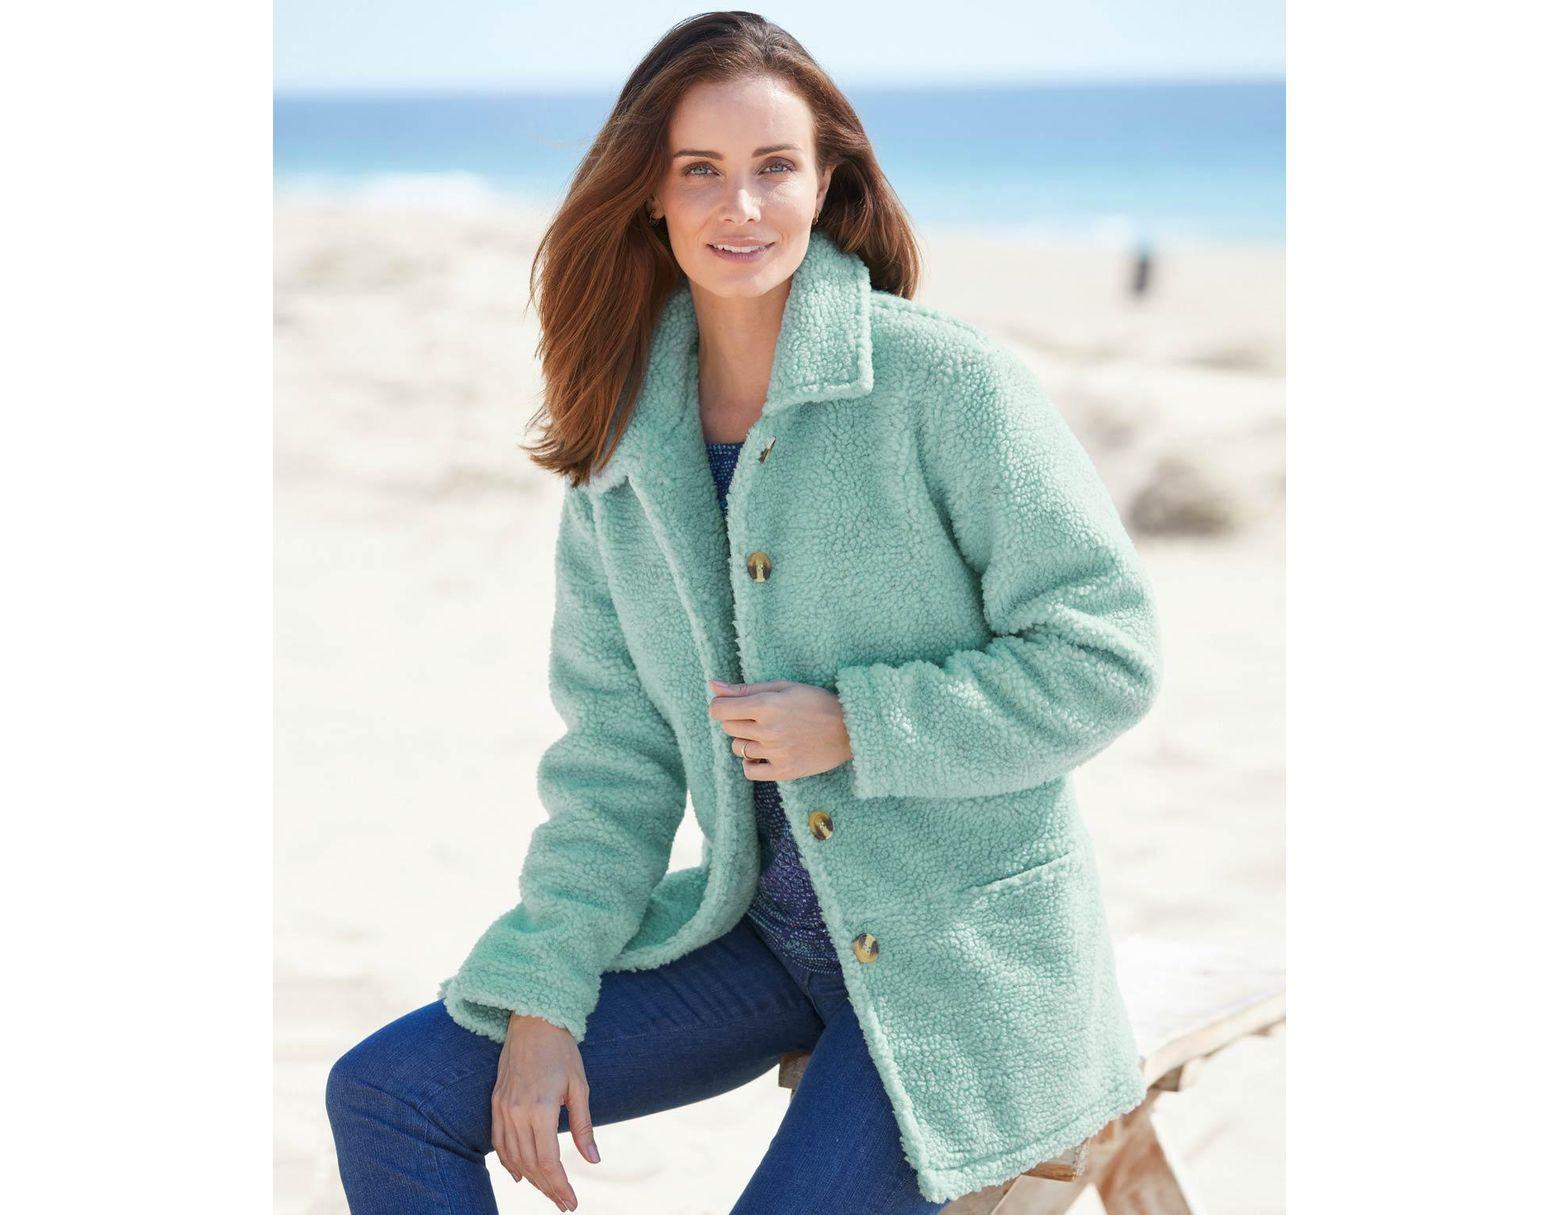 af287b34299a DAMART Sherpa Button-through Fleece Jacket in Green - Lyst